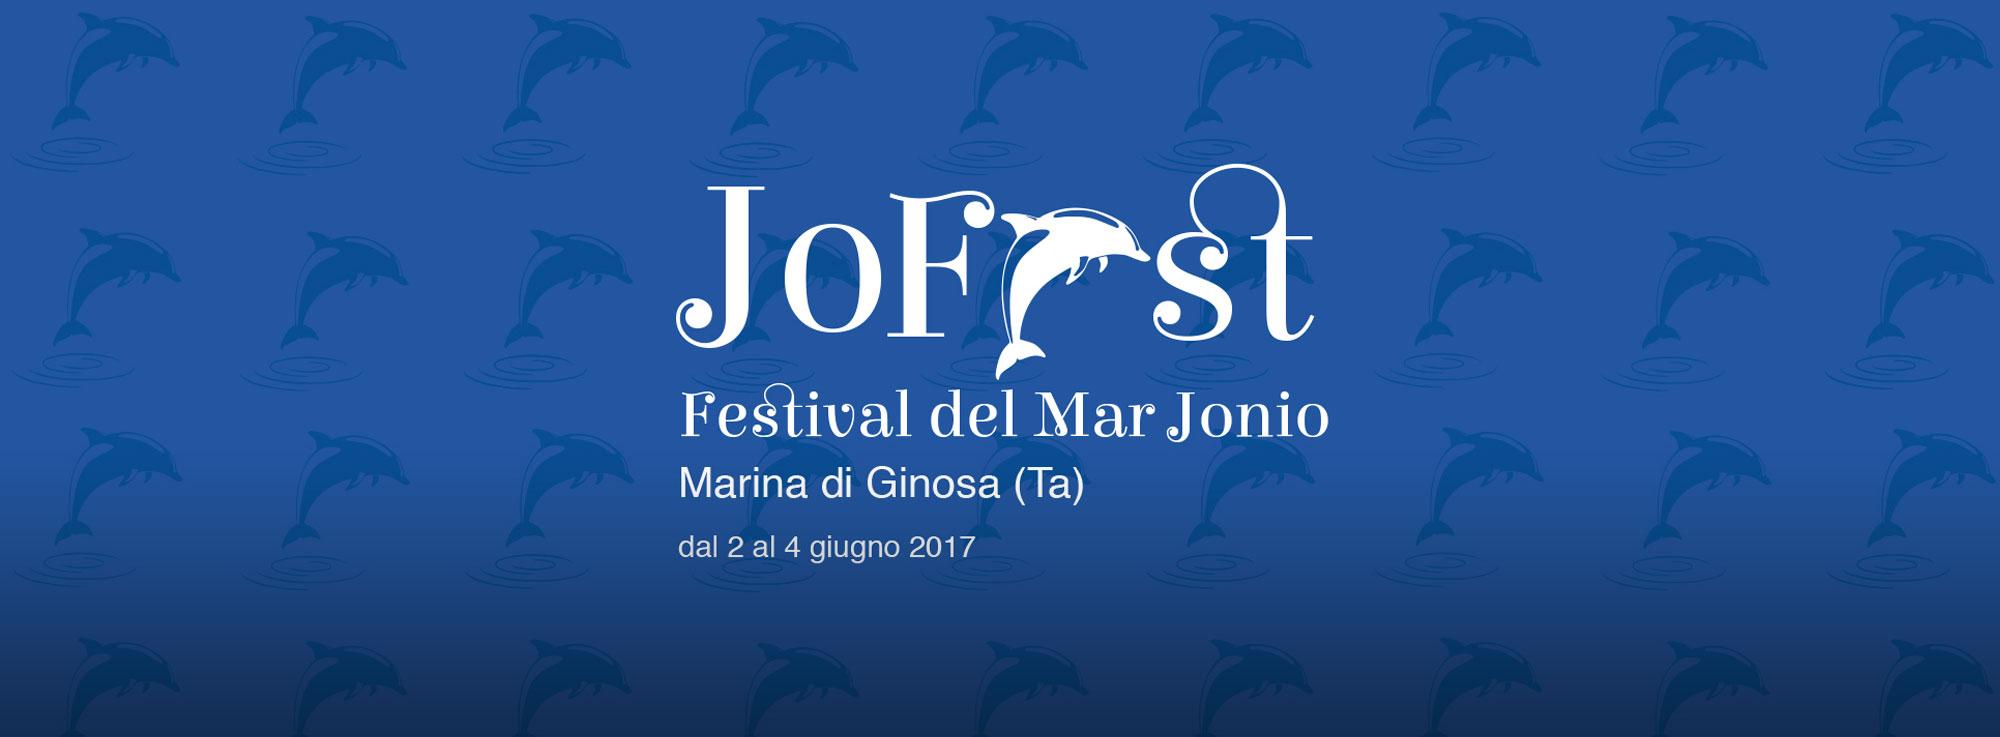 Ginosa Marina: Jofest - festival del Mar Ionio